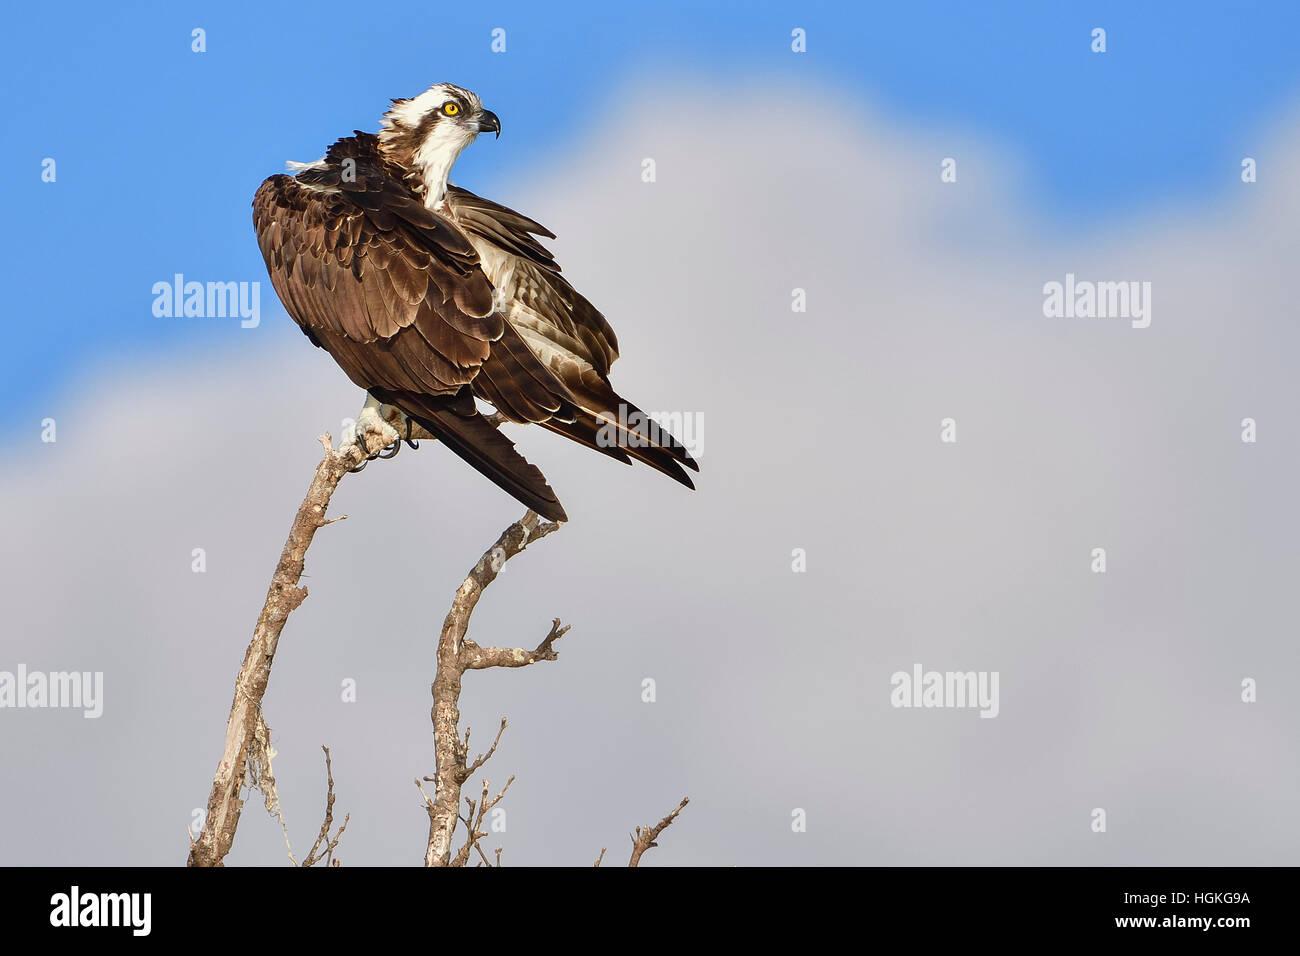 Fischadler, Fort Myers, Florida Stockfoto